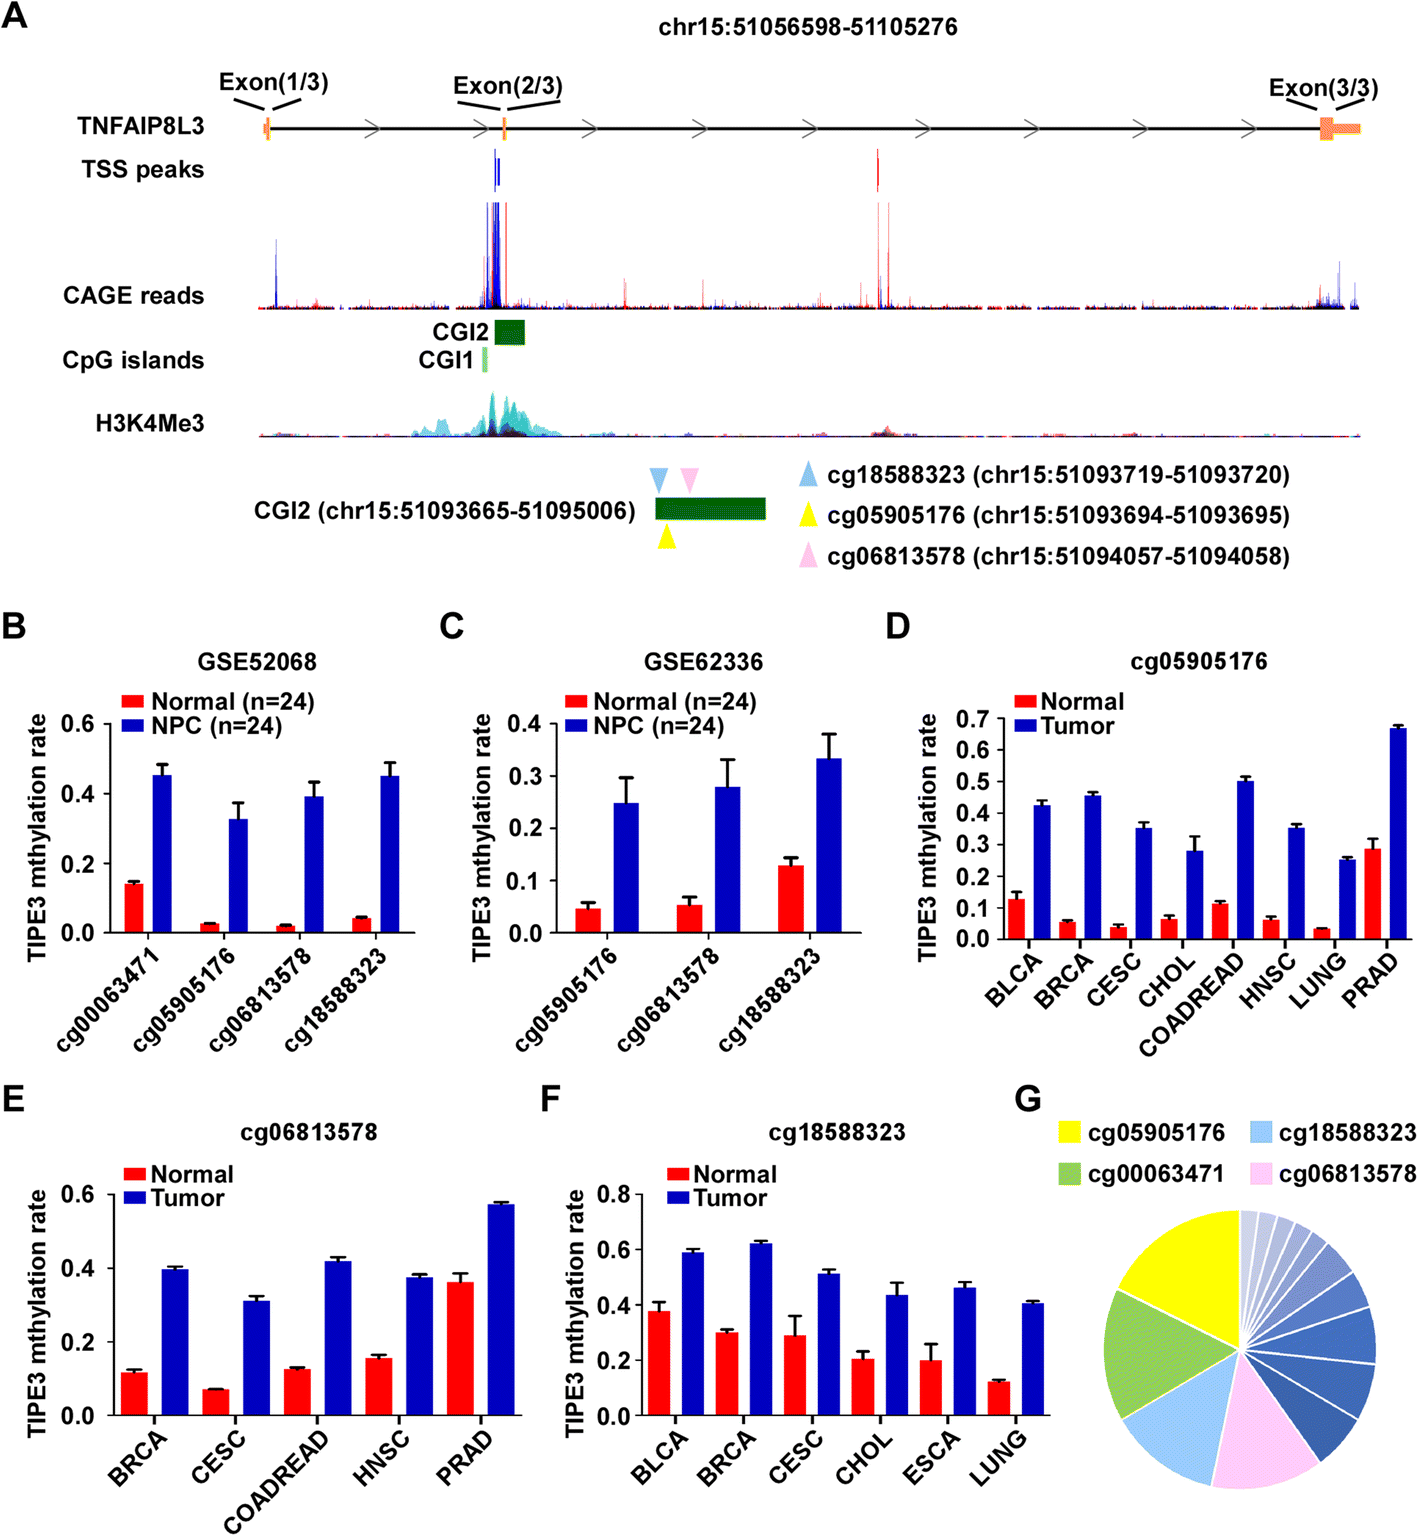 TIPE3 hypermethylation correlates with worse prognosis and promotes